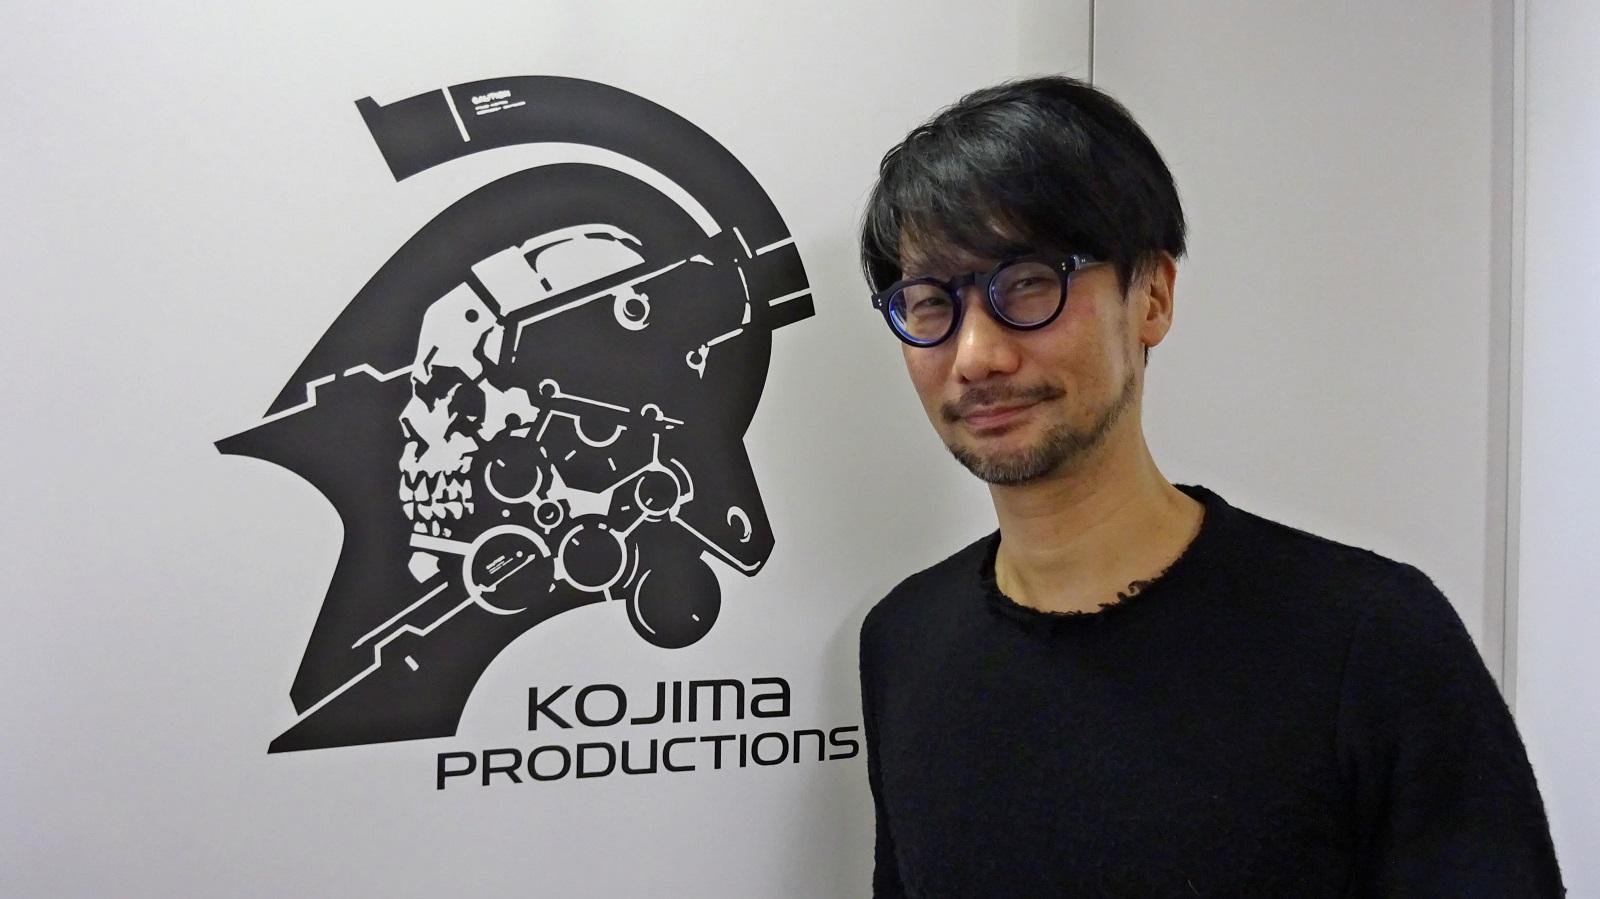 Сотрудник Kojima Productions заразился коронавирусом. Коллег уже поддержали Remedy и505 Games